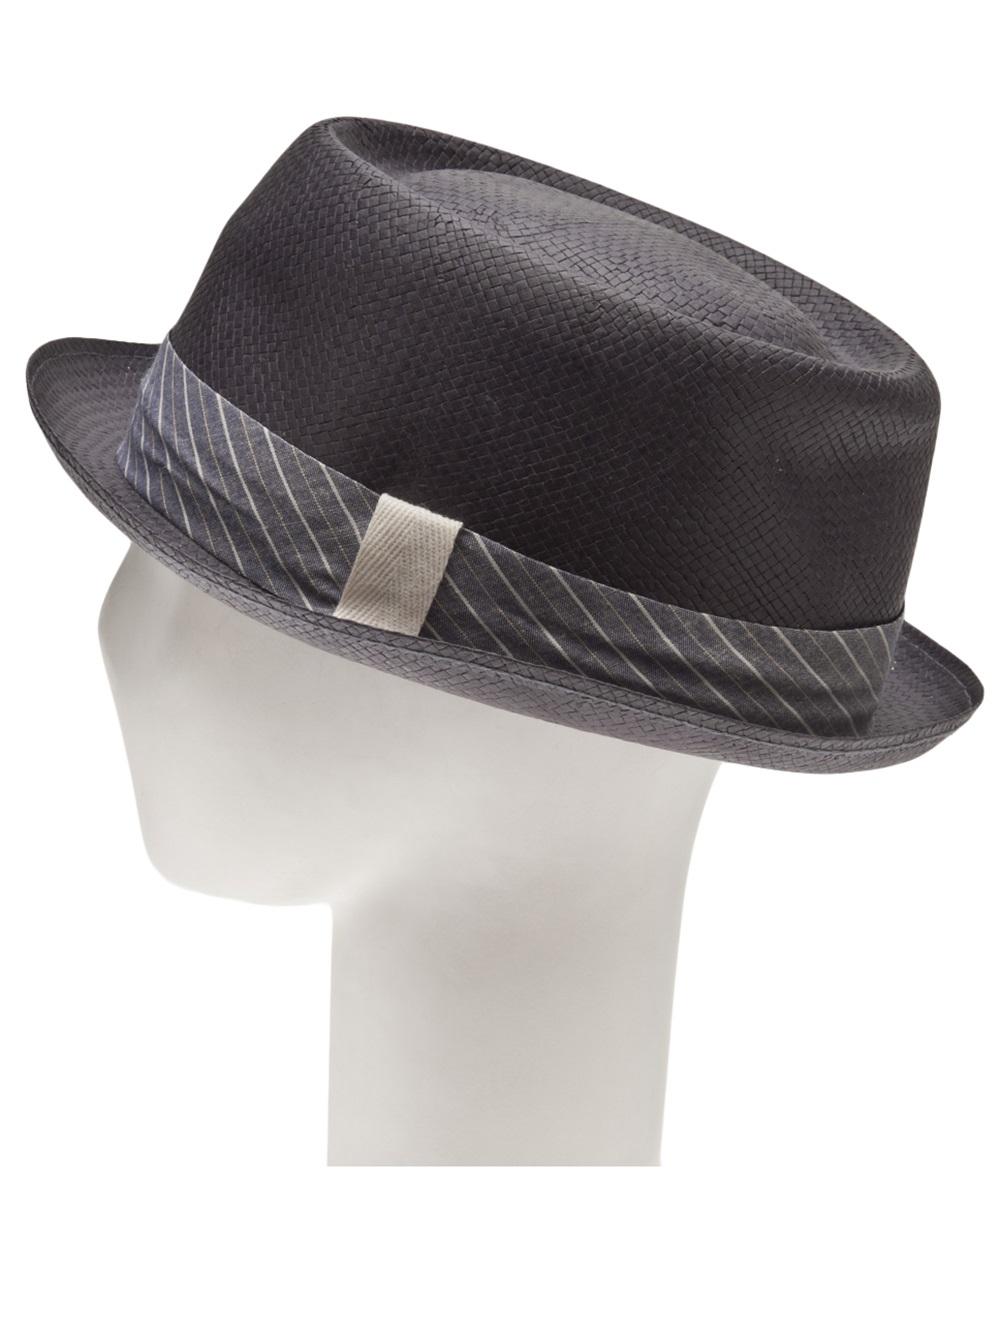 abebeb986b0 Rag   Bone Summer Pork Pie Hat in Gray for Men - Lyst